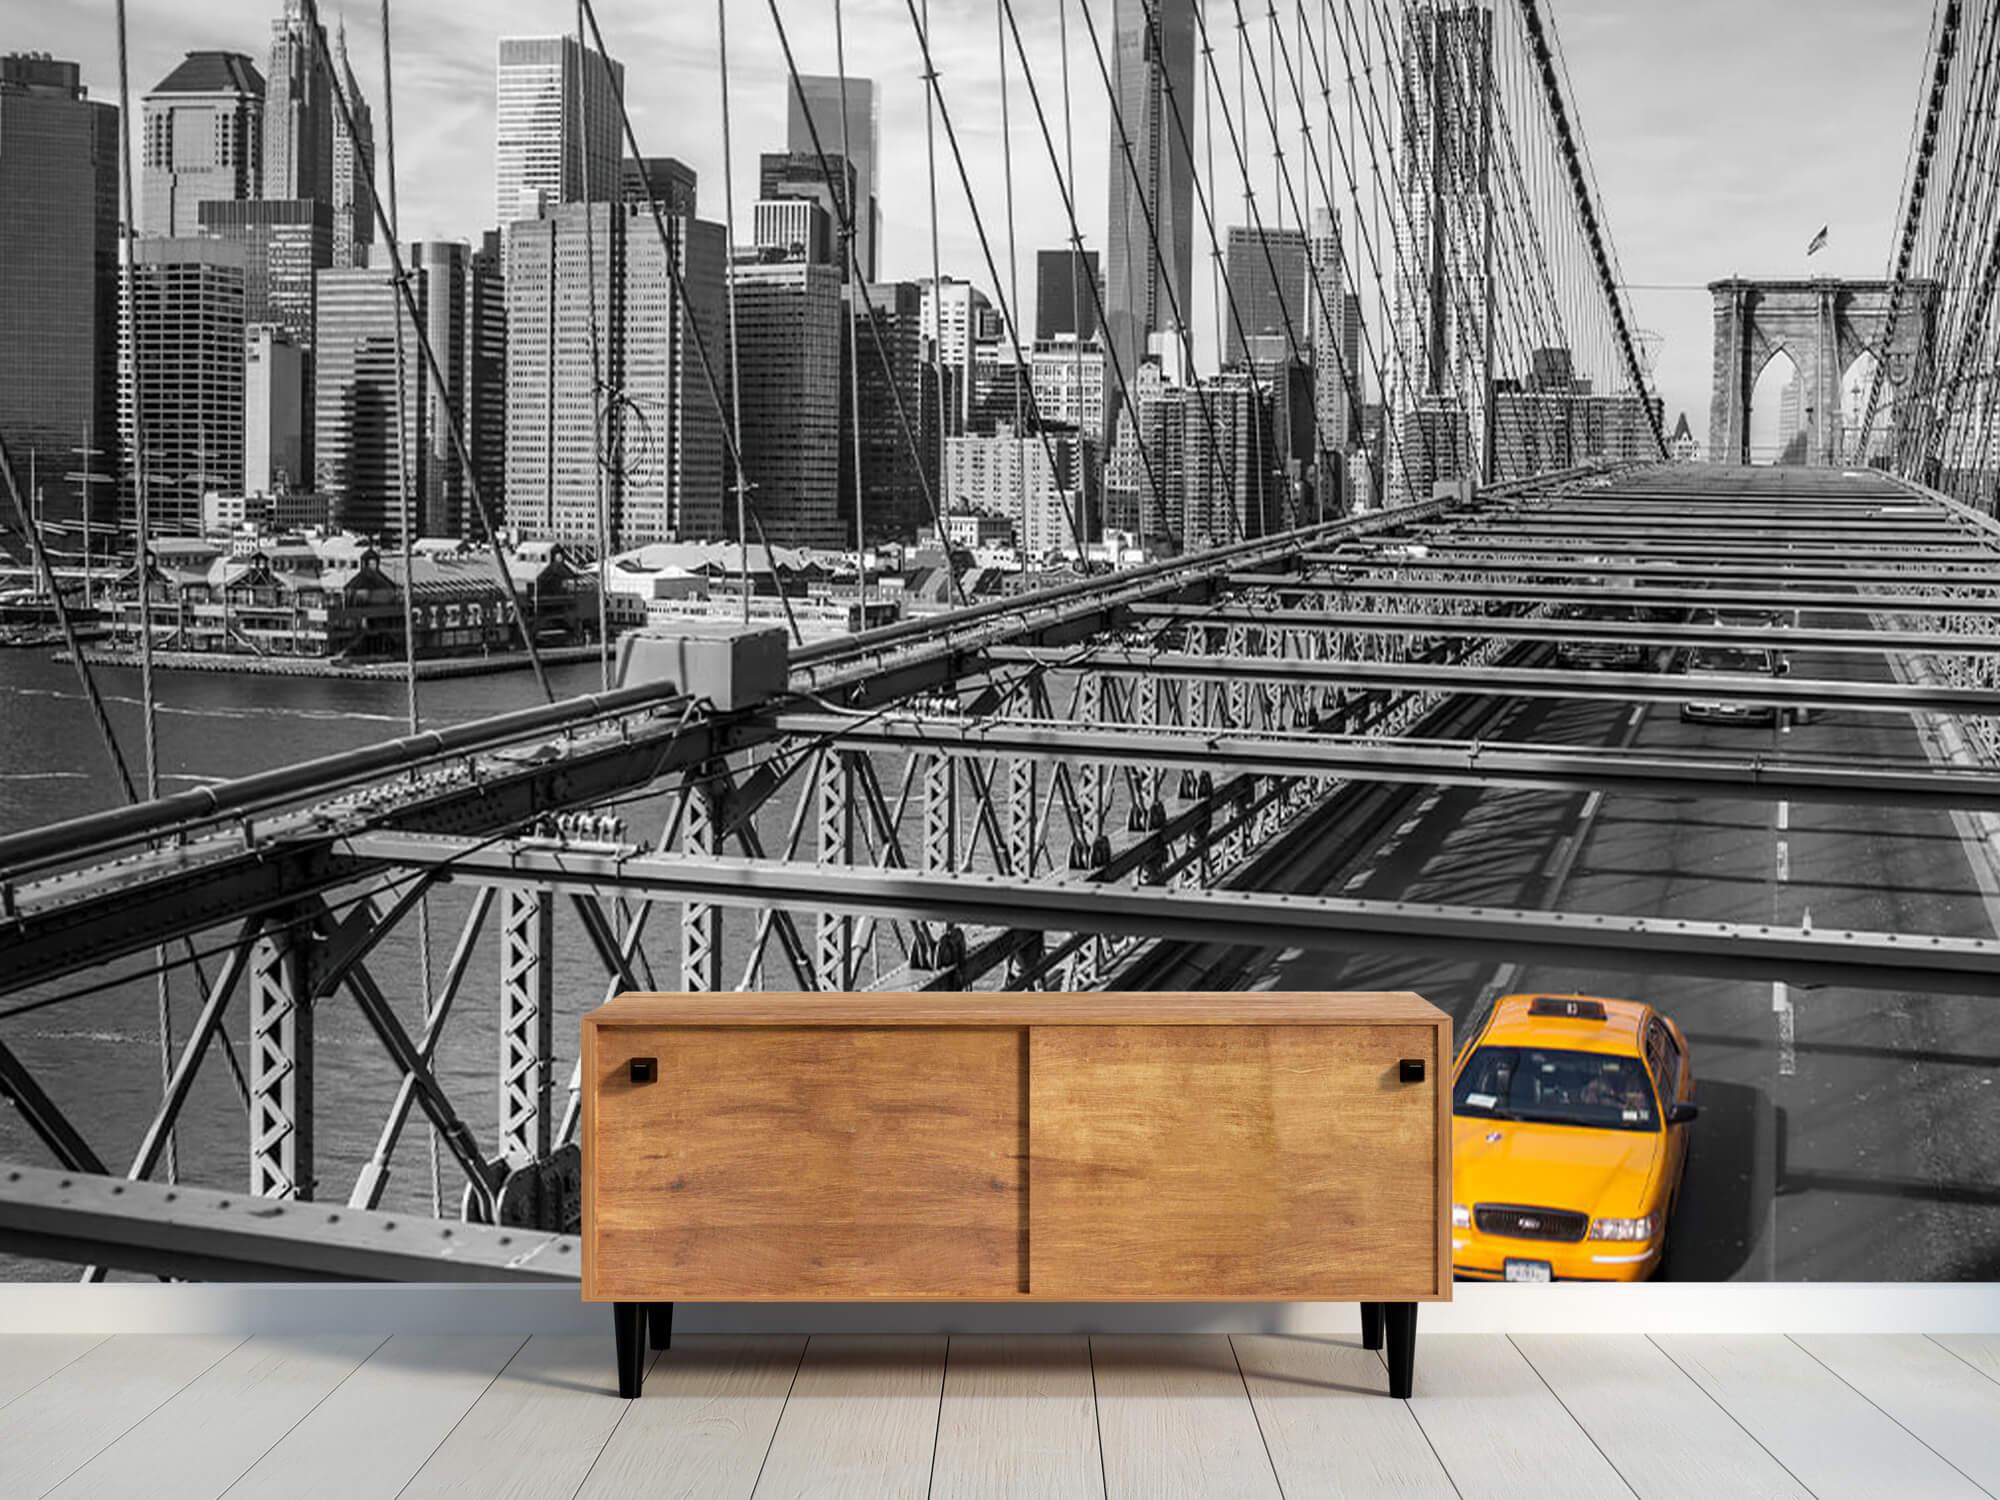 Un taxi sur le pont de Brooklyn 11